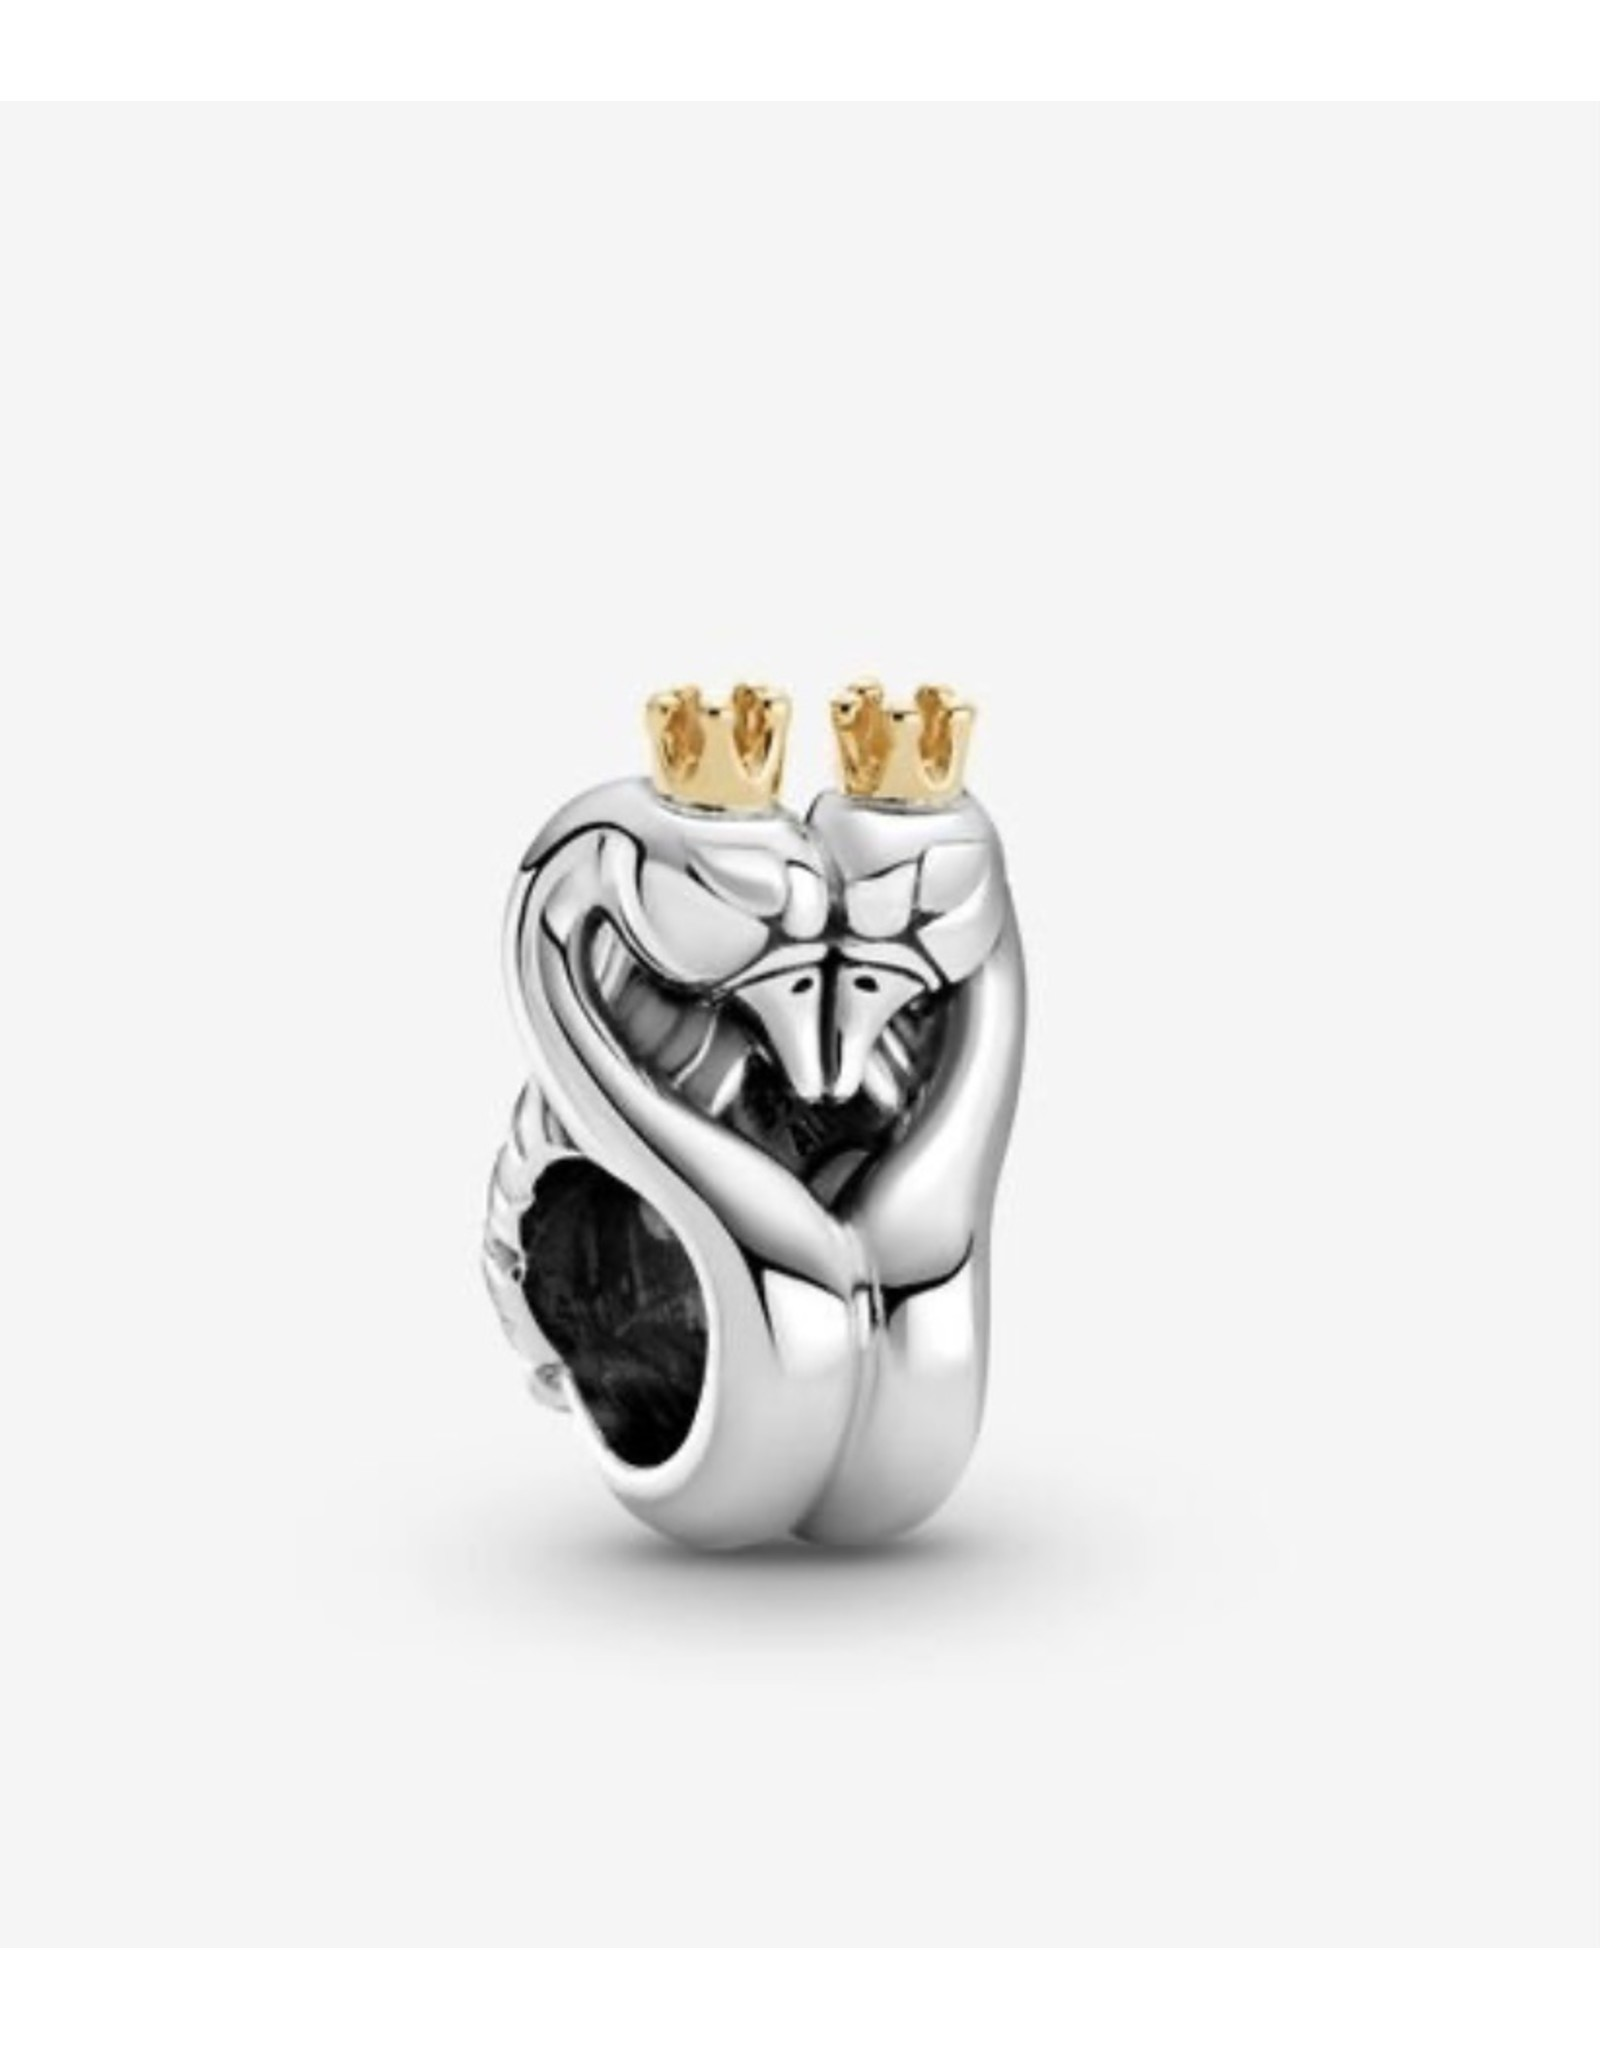 Pandora Pandora Charm,799315C00, Two-Tone Swans & Heart,14K Gold